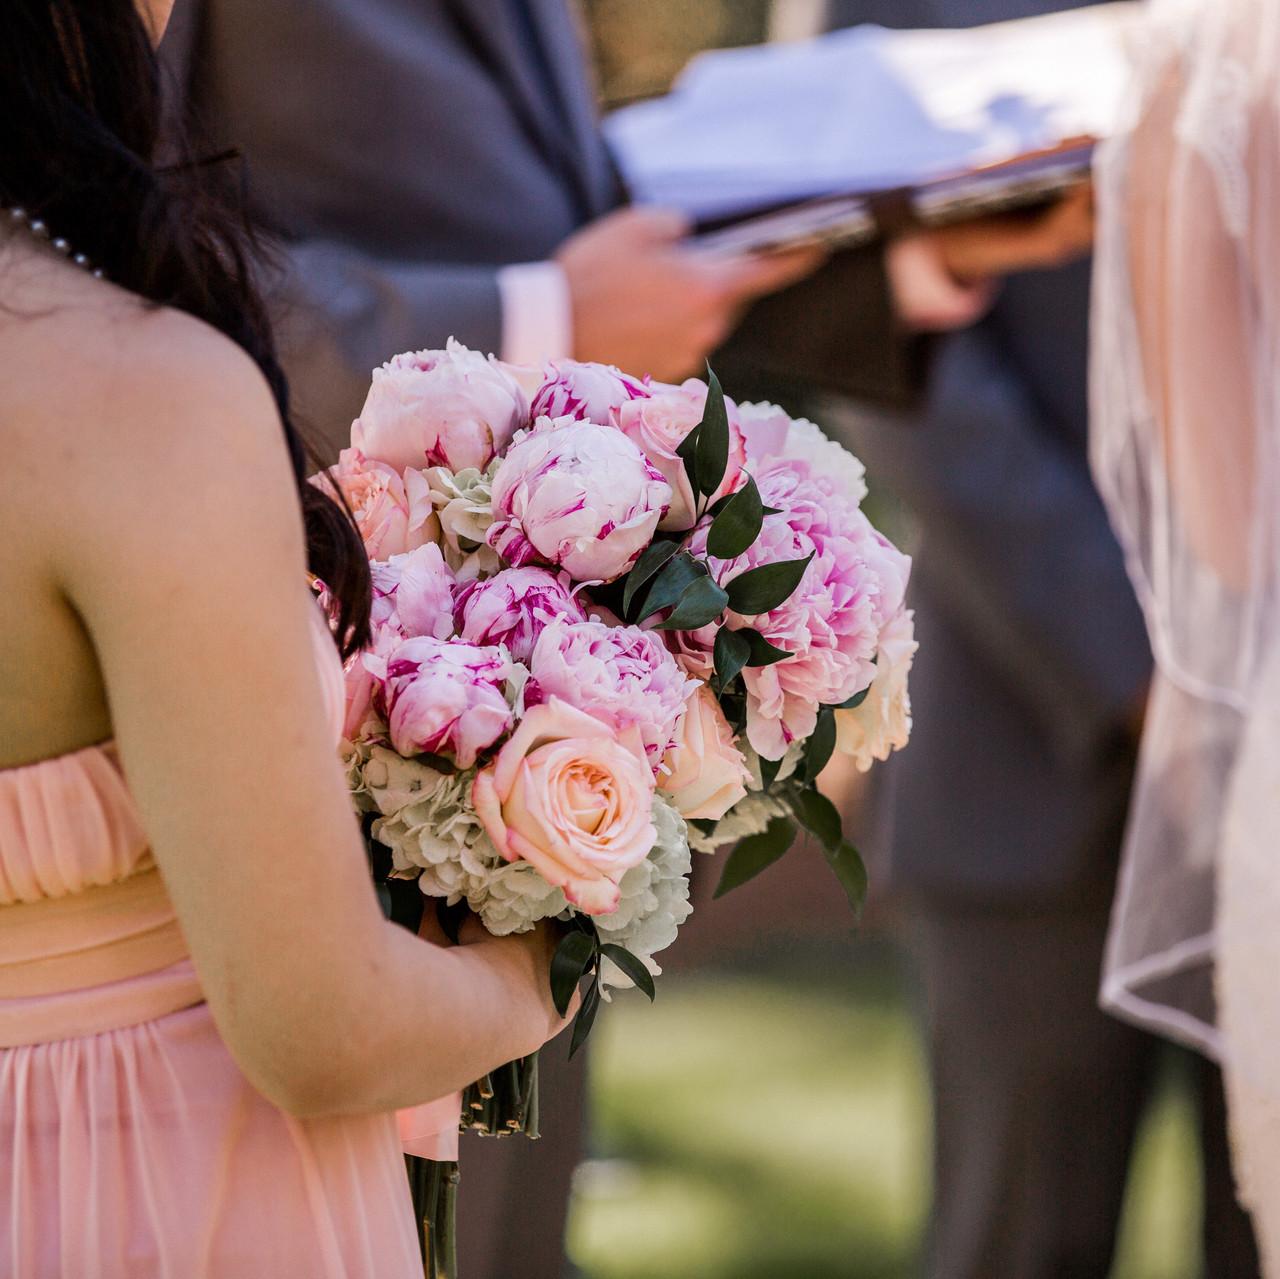 A-Floral-Affair-HYATT-LAKE-TAHOE-WEDDING-FLORIST (25).jpg